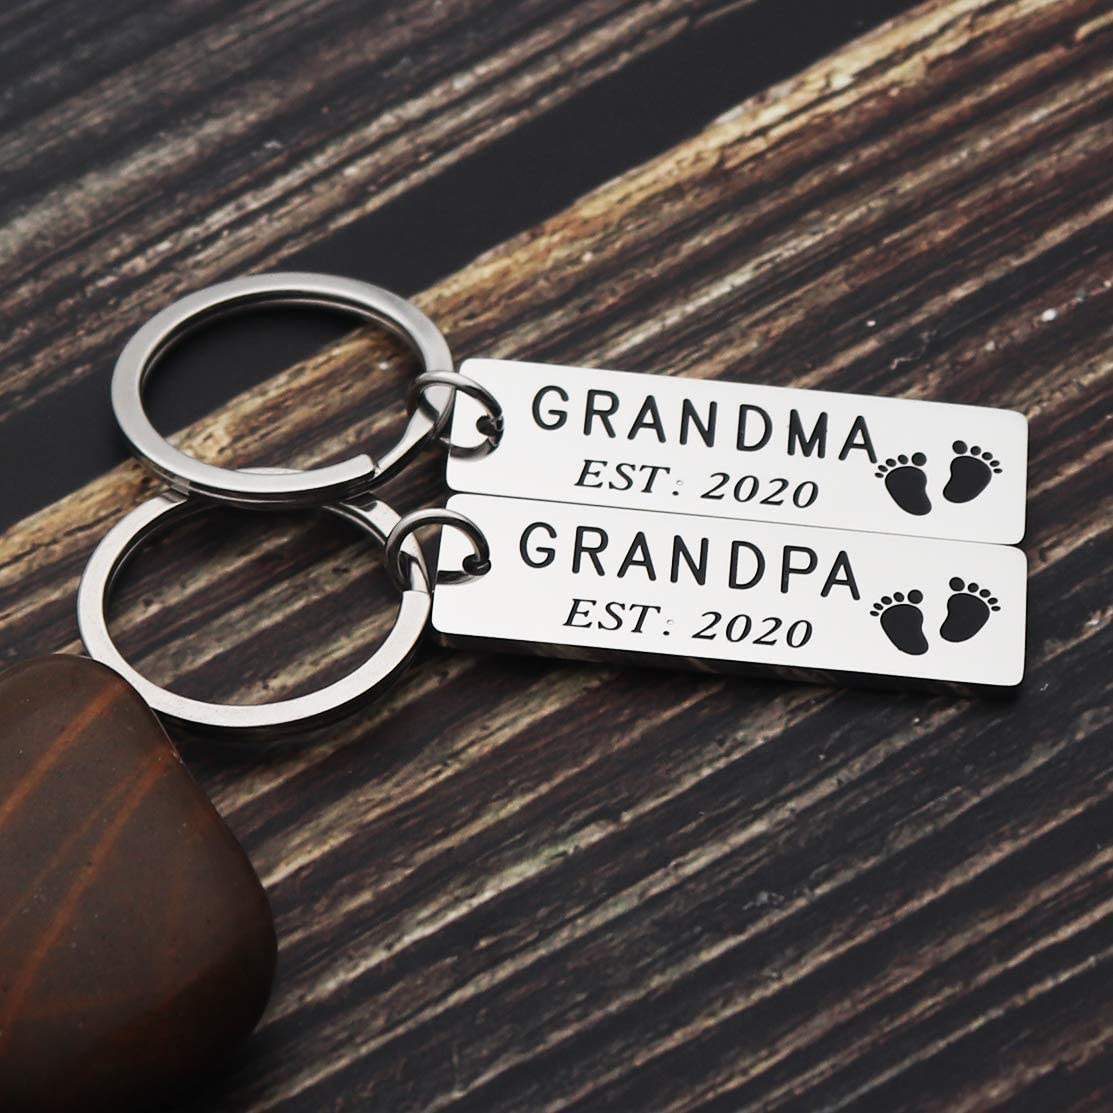 Asqunpin Pregnancy Announcement Grandparents Grandma Grandpa Est 2020 Keychain Set New Grandparent Gifts Pregnancy Reveal to Grandparents